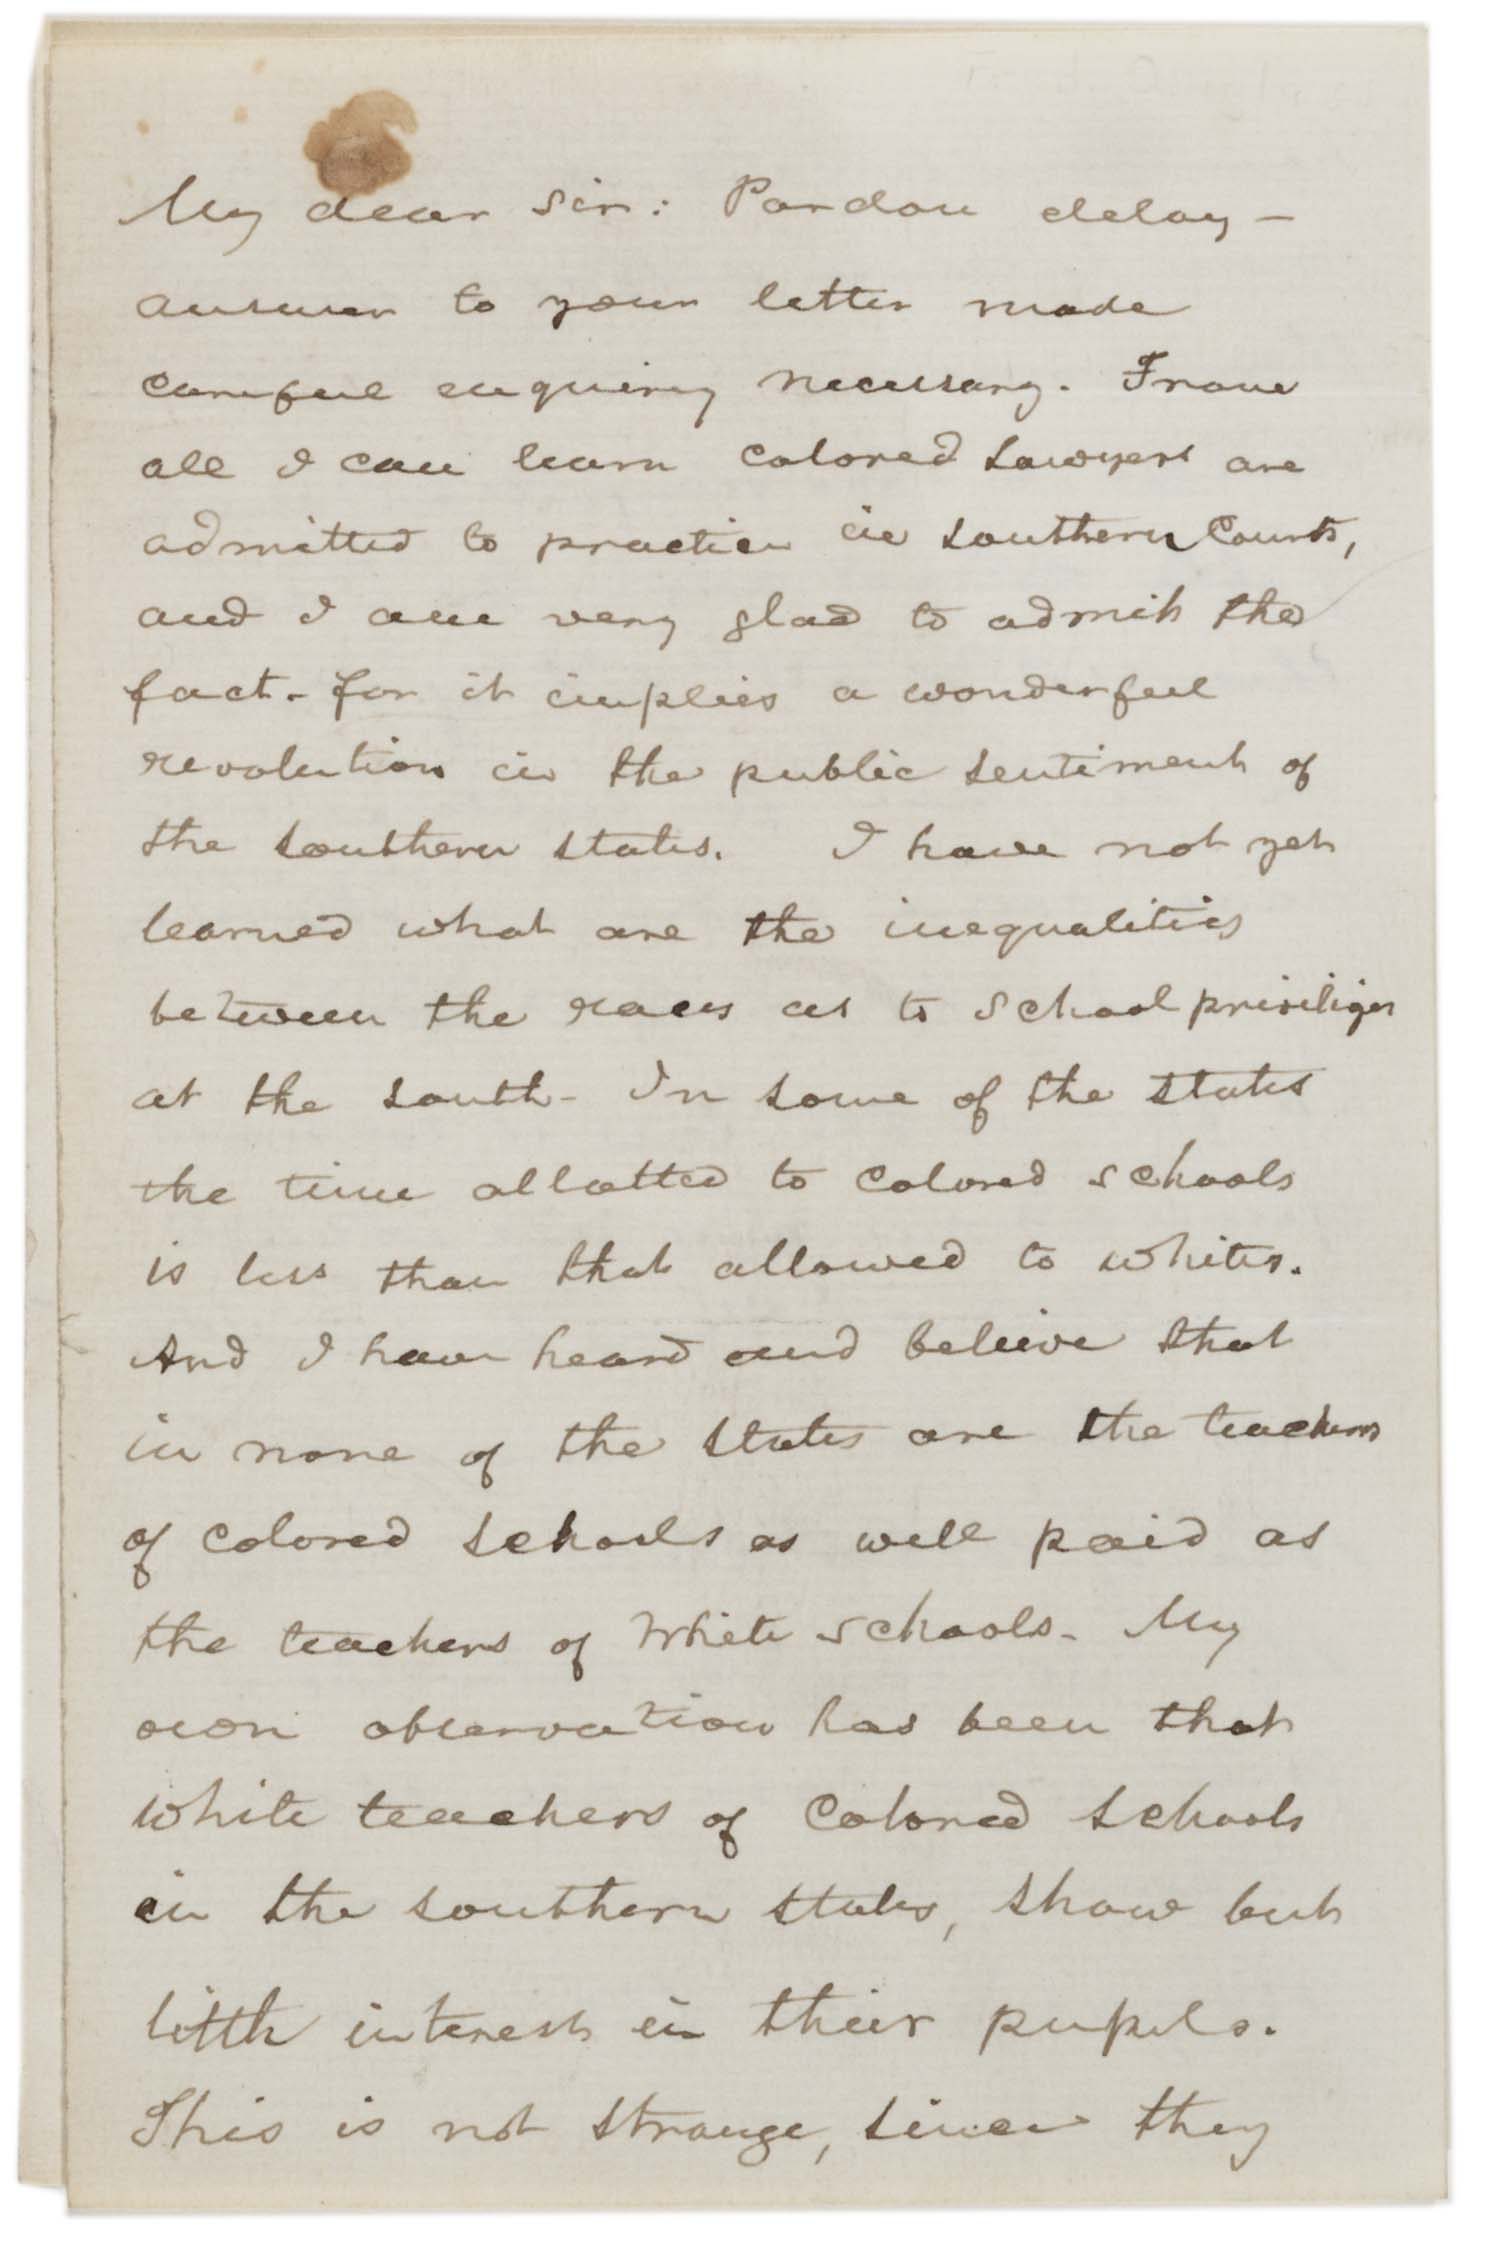 Frederick Douglass to unknown, November 23, 1887 (Gilder Lehrman Collection)